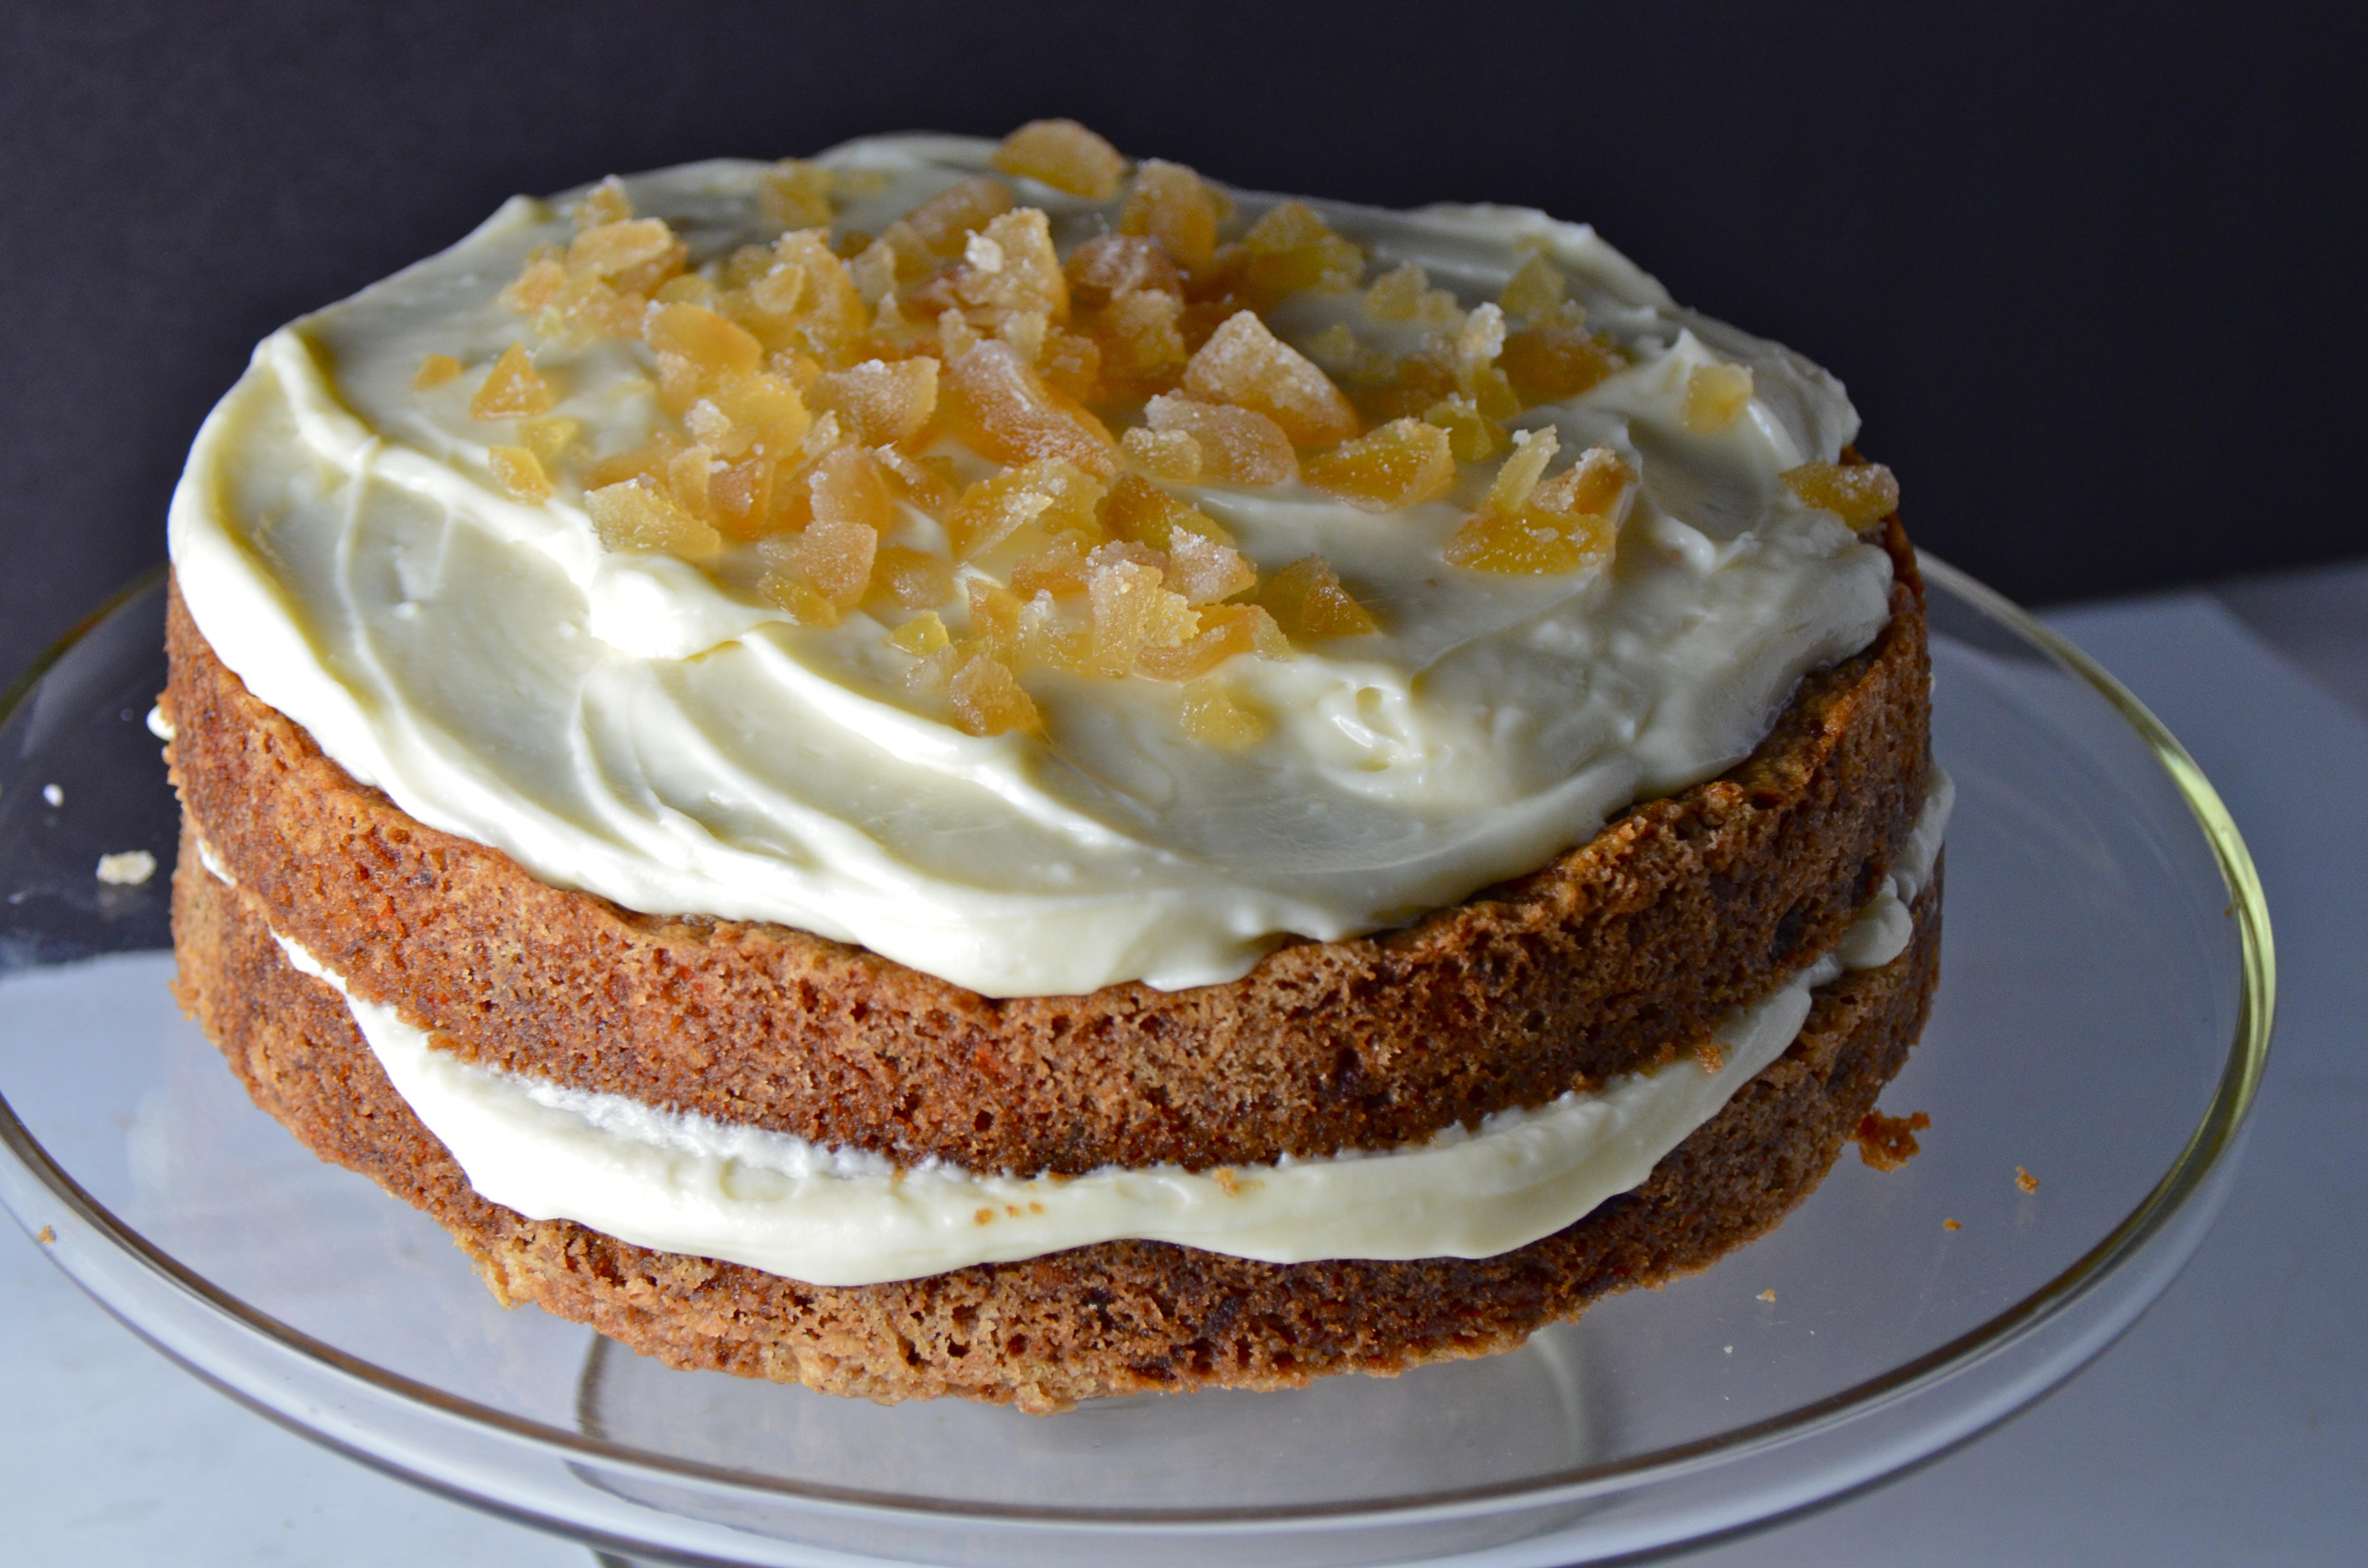 Ina Garten Carrot Cake With Ginger Mascarpone Frosting